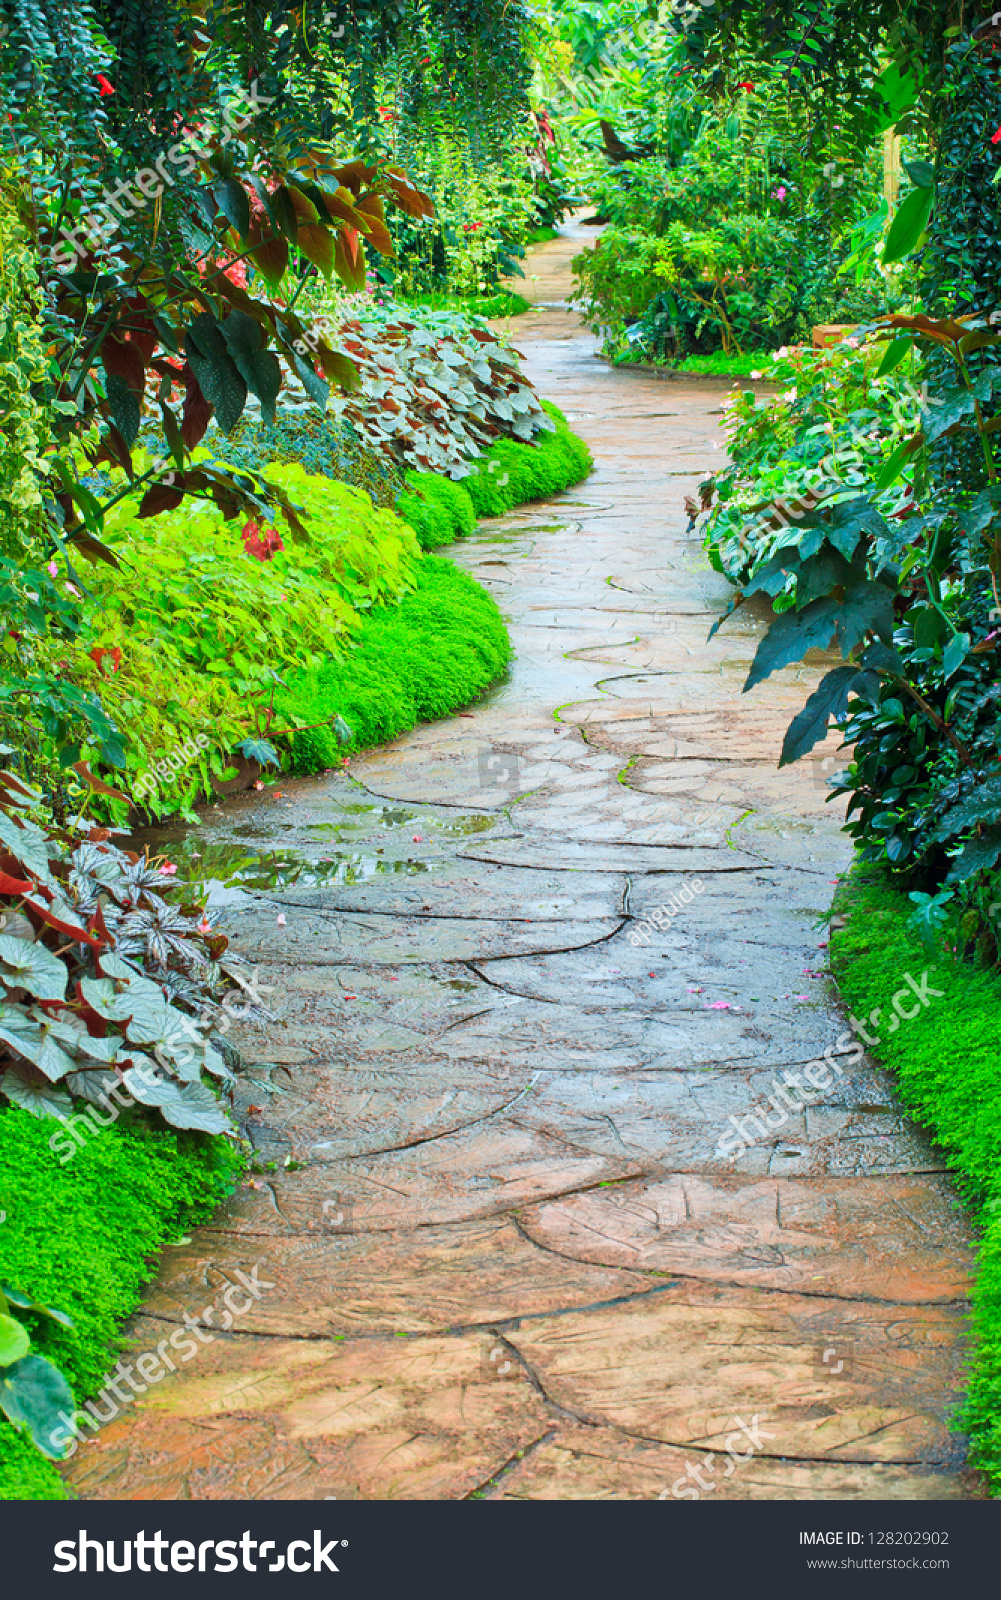 garden path in flower garden - Flower Garden Path